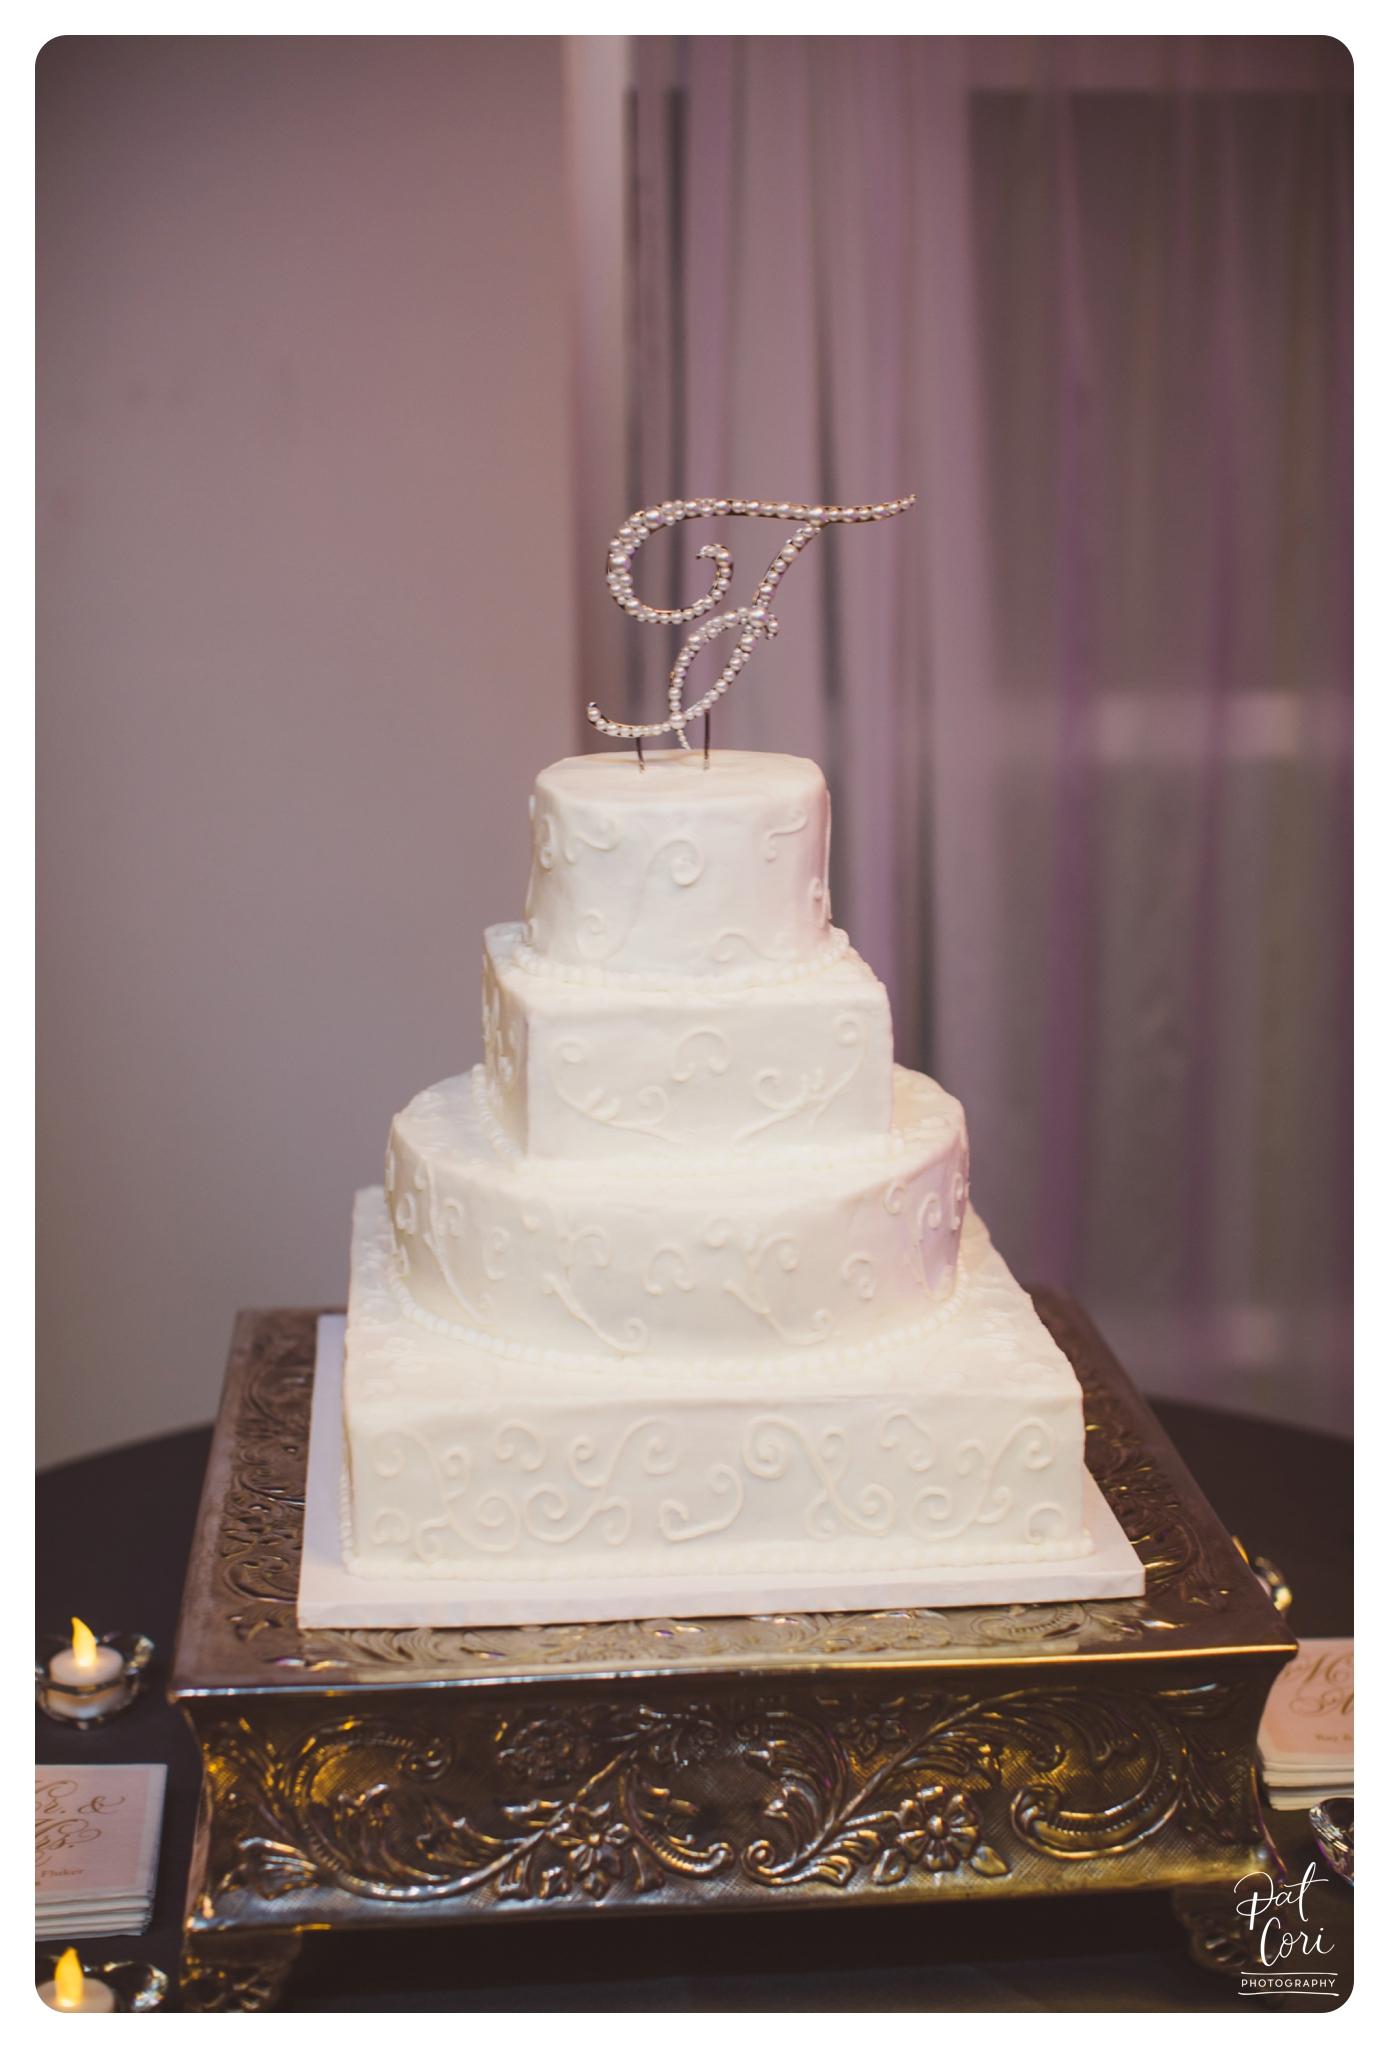 Center-in-the-Square-_-Weddings-Wedding-Photographer-Virginia-041.jpg